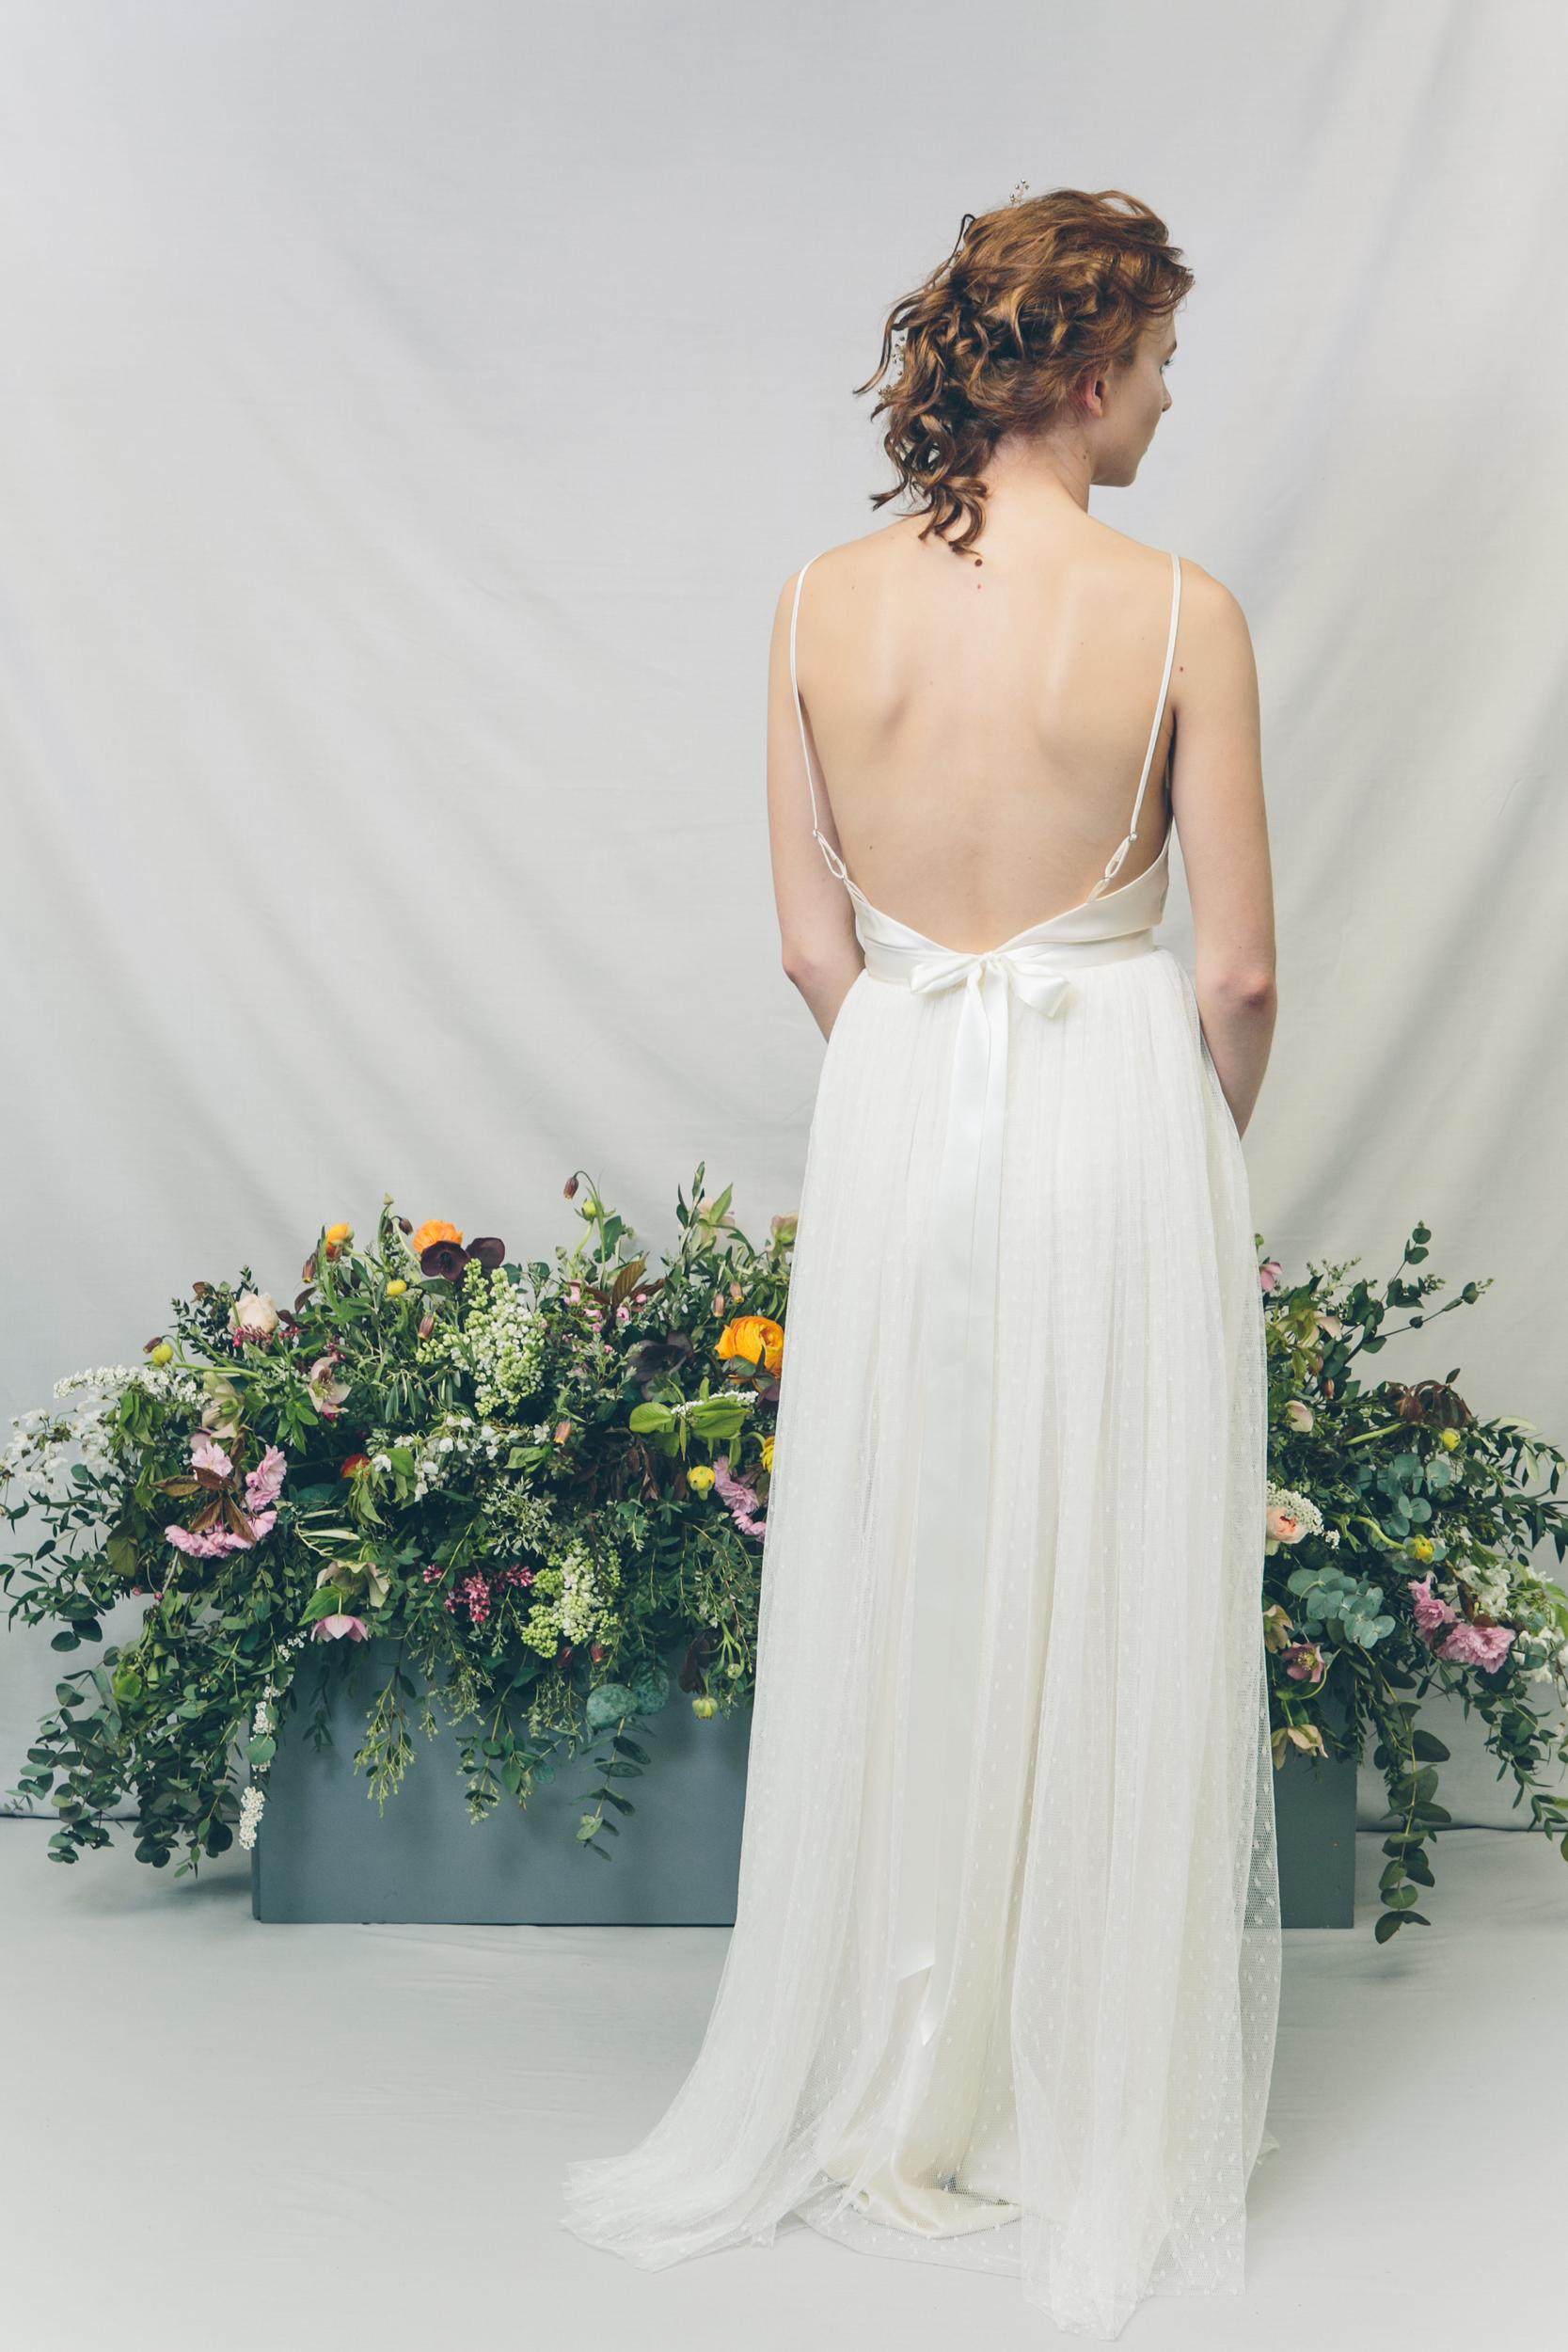 Kate-Beaumont-Wedding-Dresses-Sheffield-55.jpg